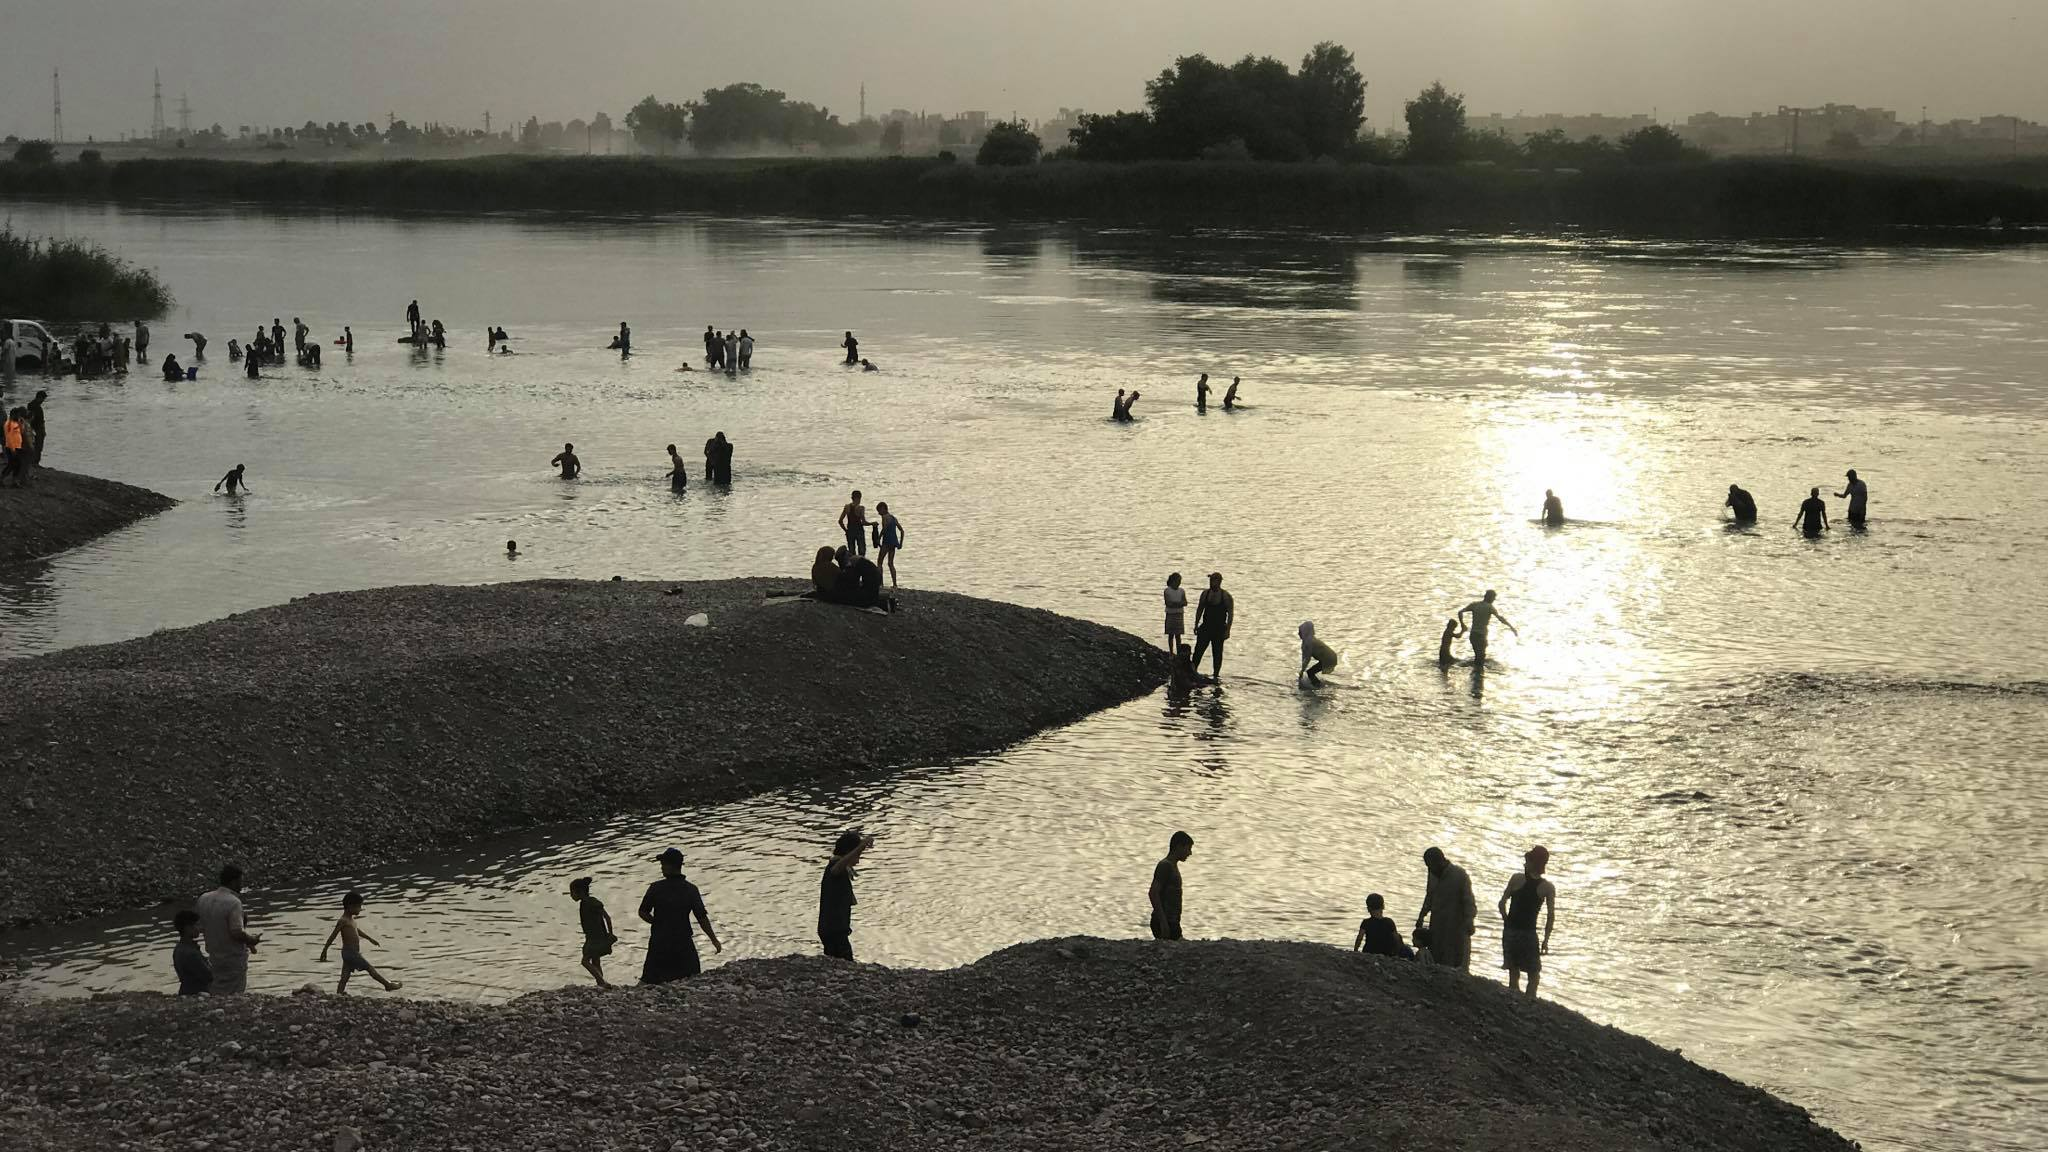 Ljudi plivaju u reci